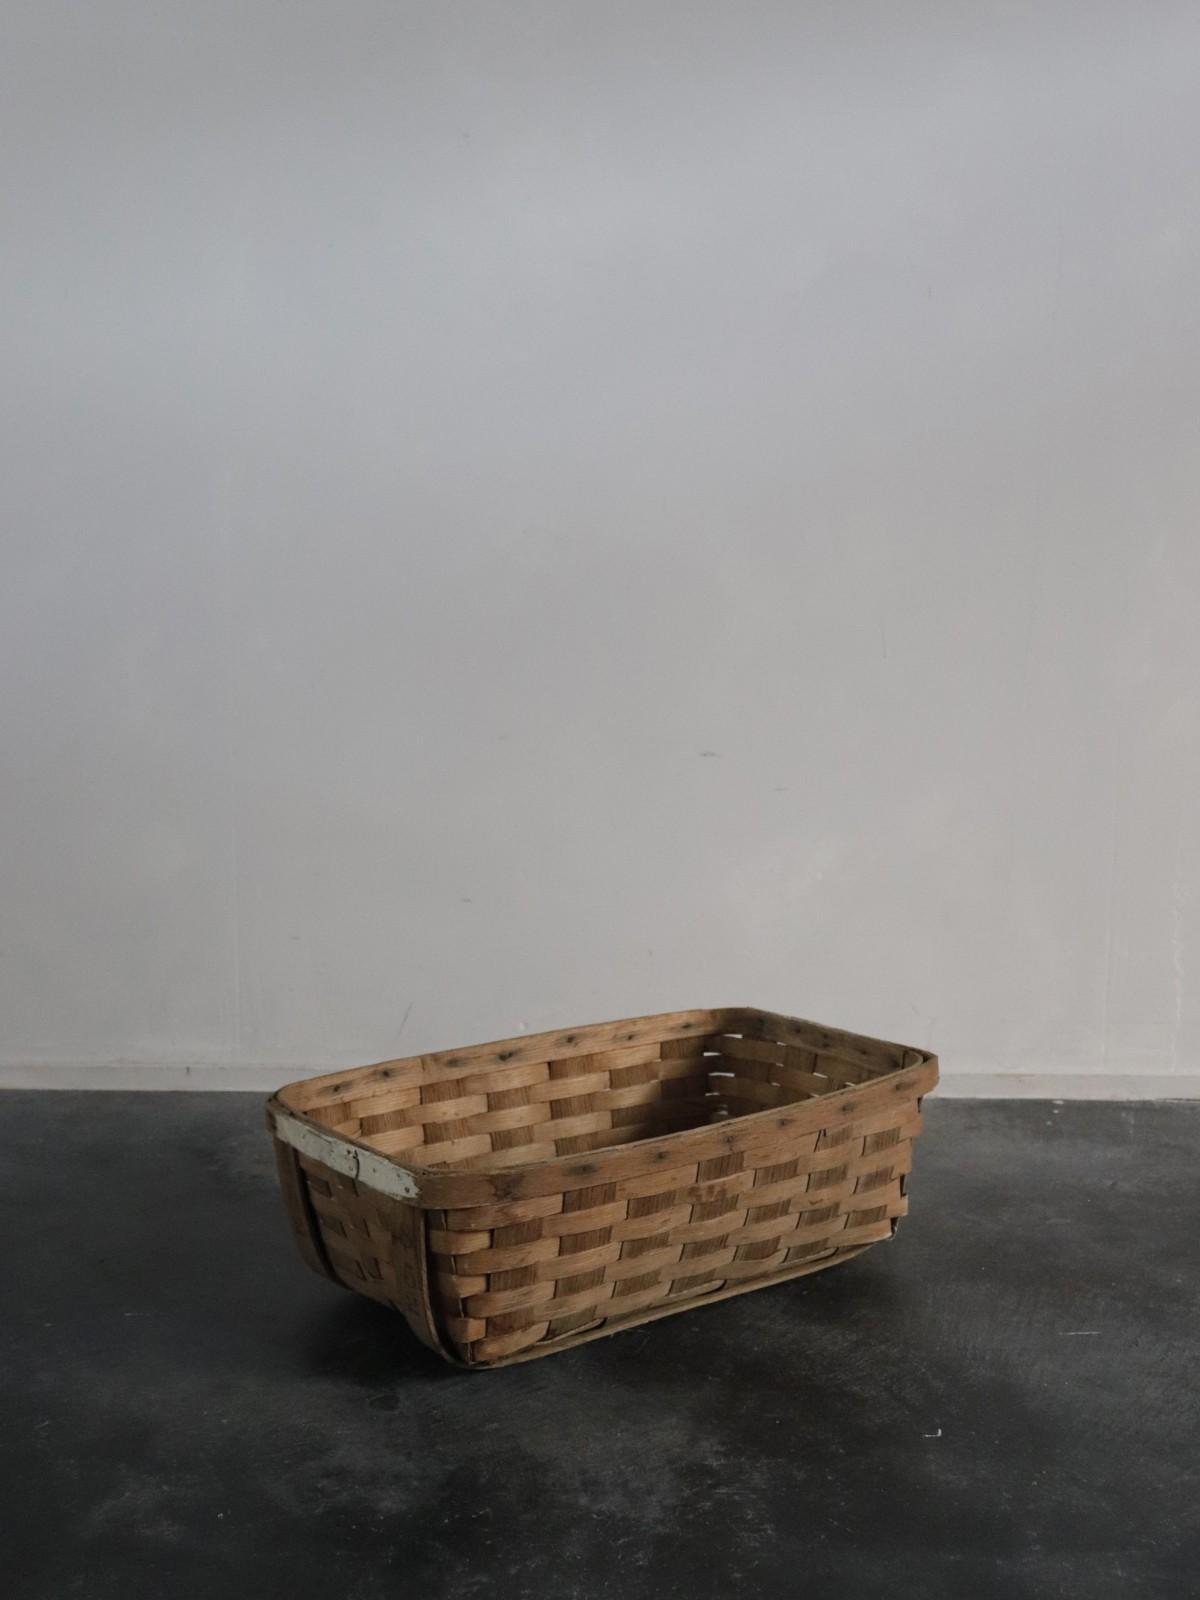 vegitable basket, usa, wood basket